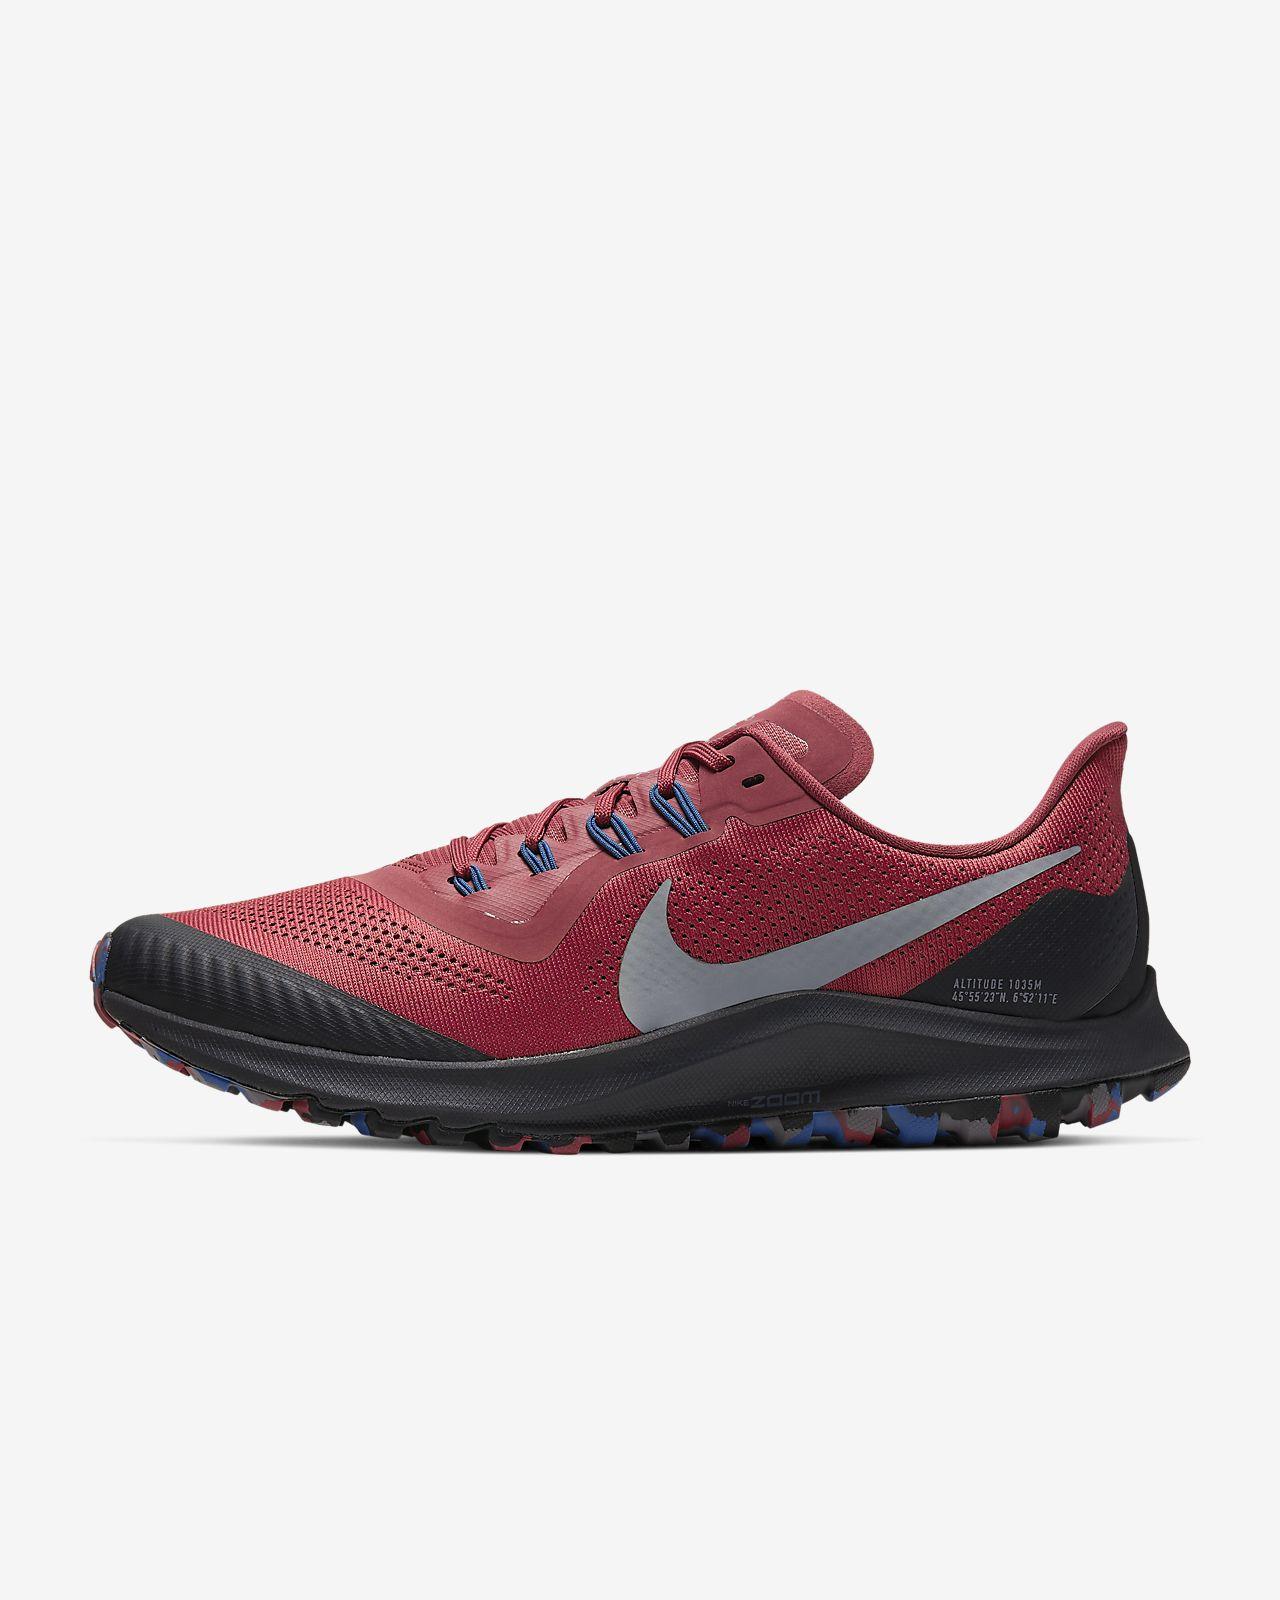 Chaussure de running Nike Pegasus Trail pour Homme